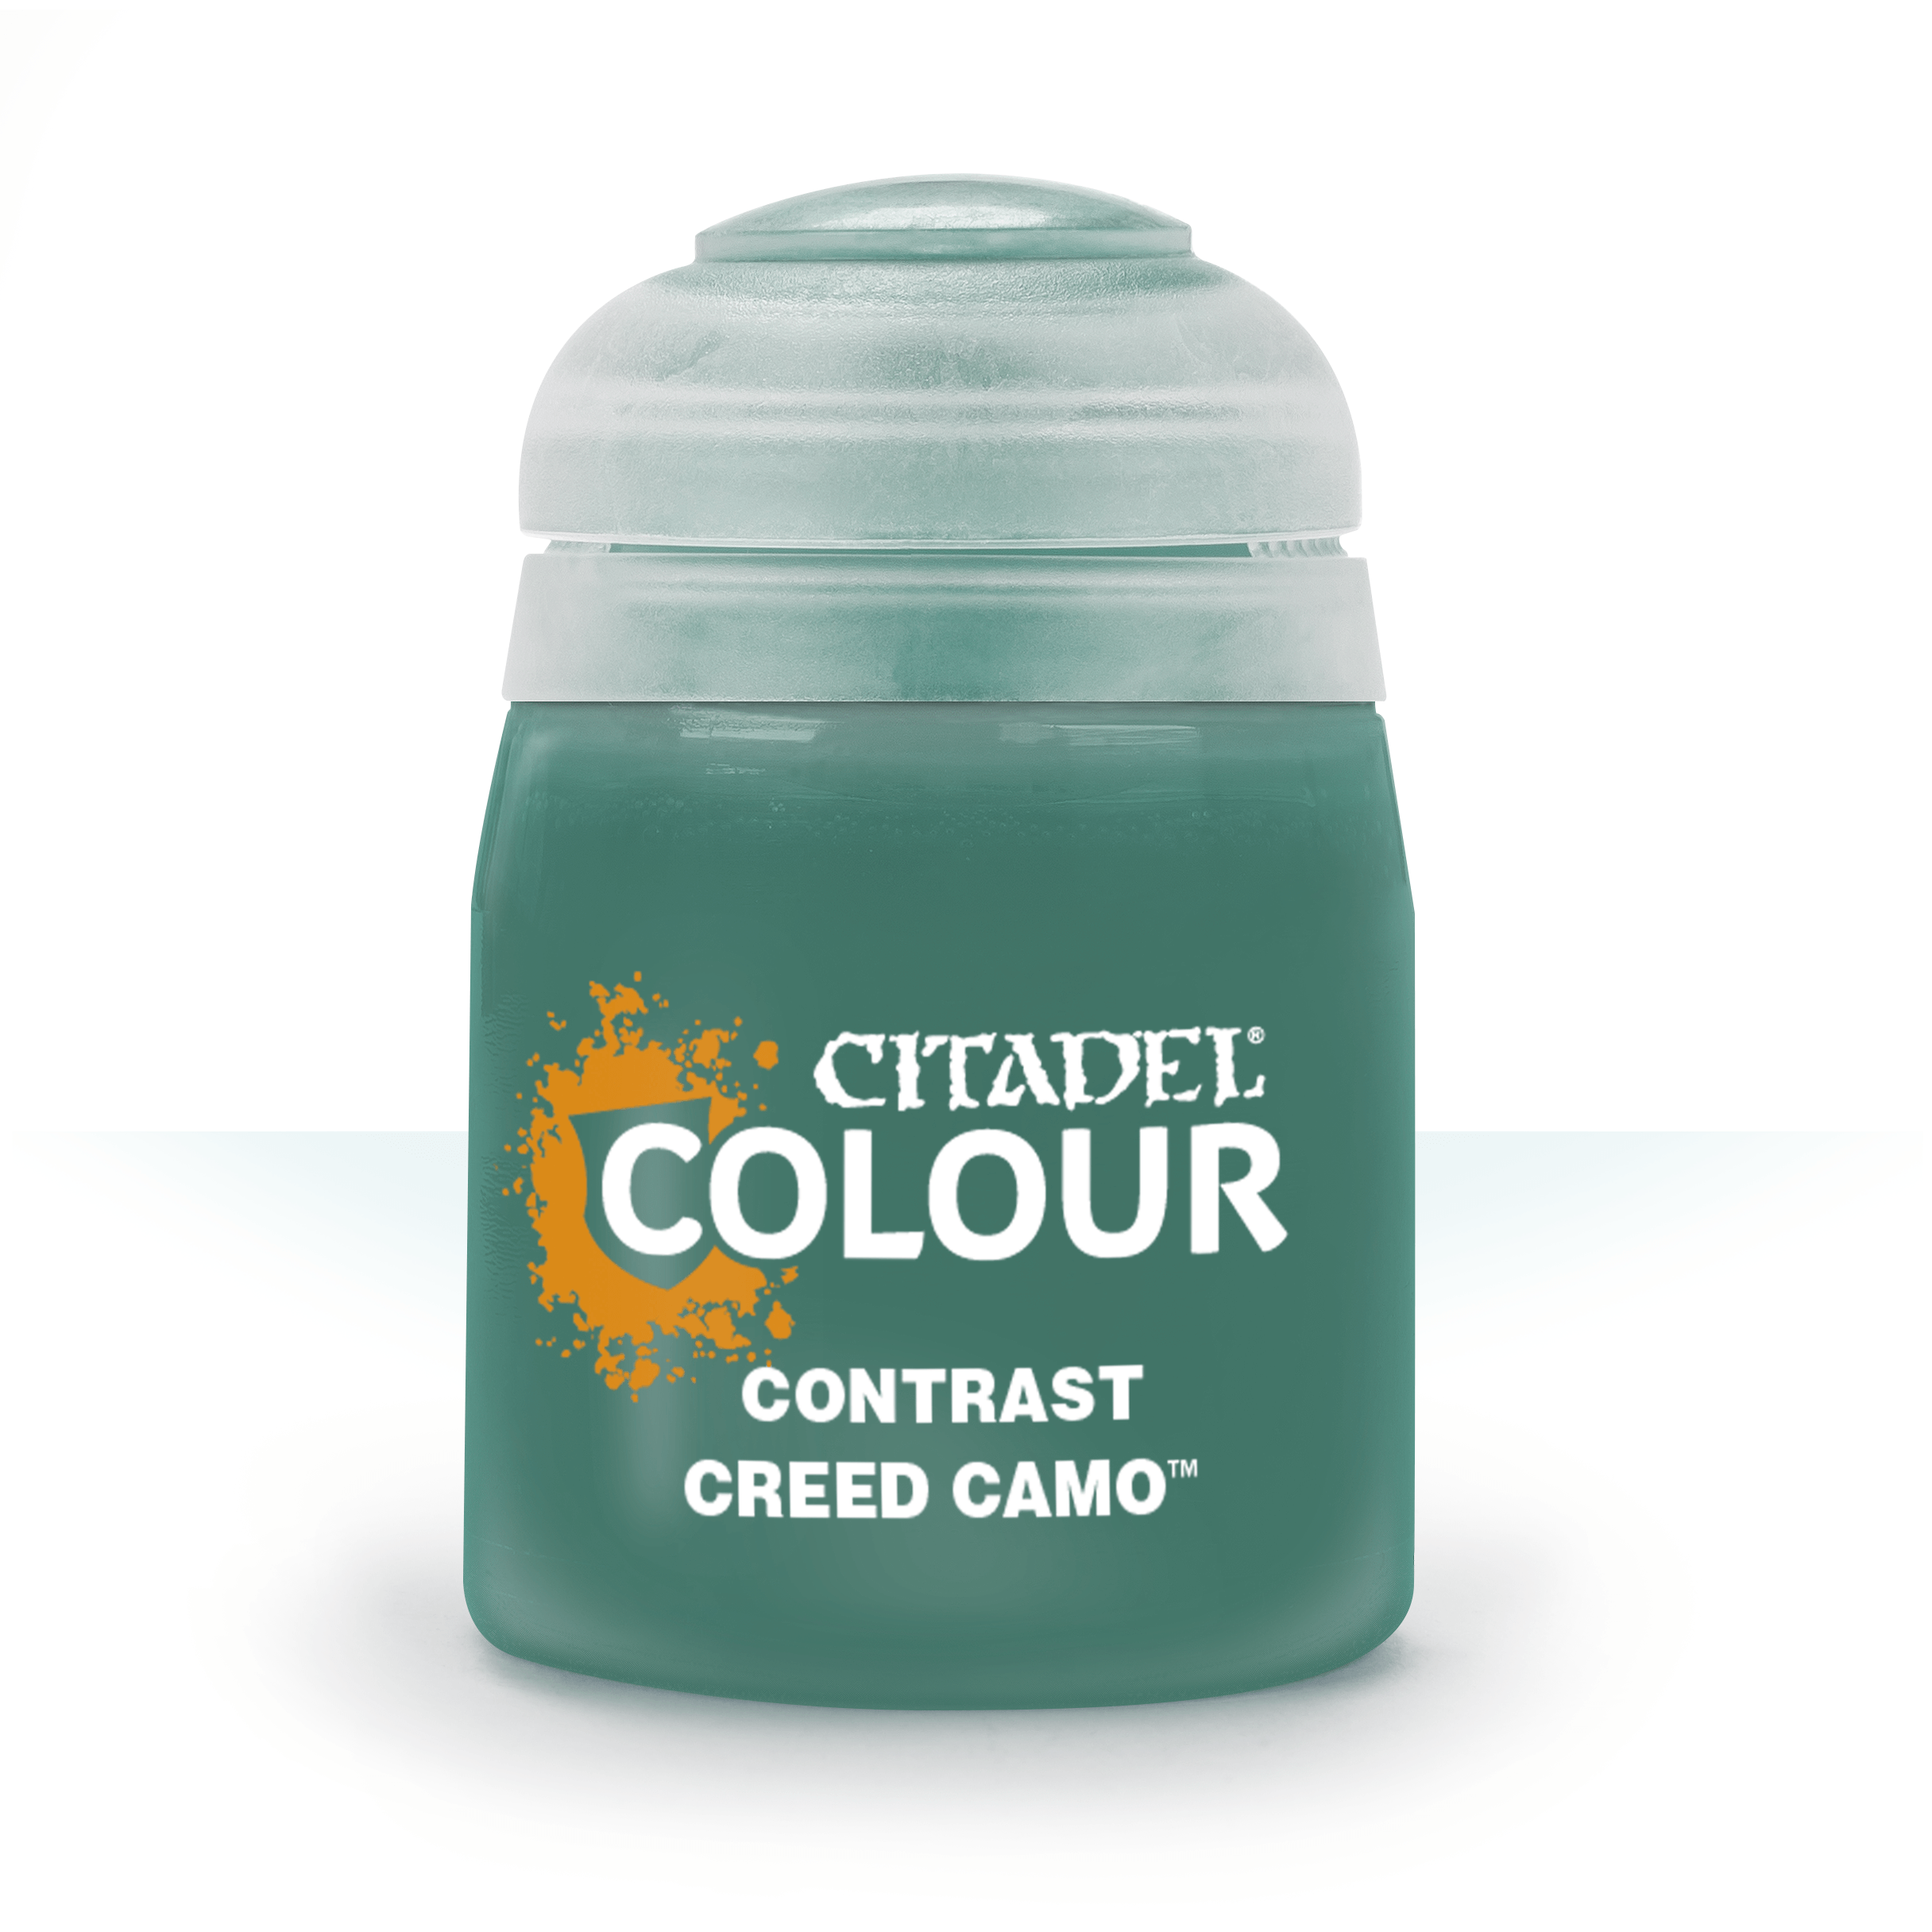 Creed Camo, Citadel Contrast 18ml